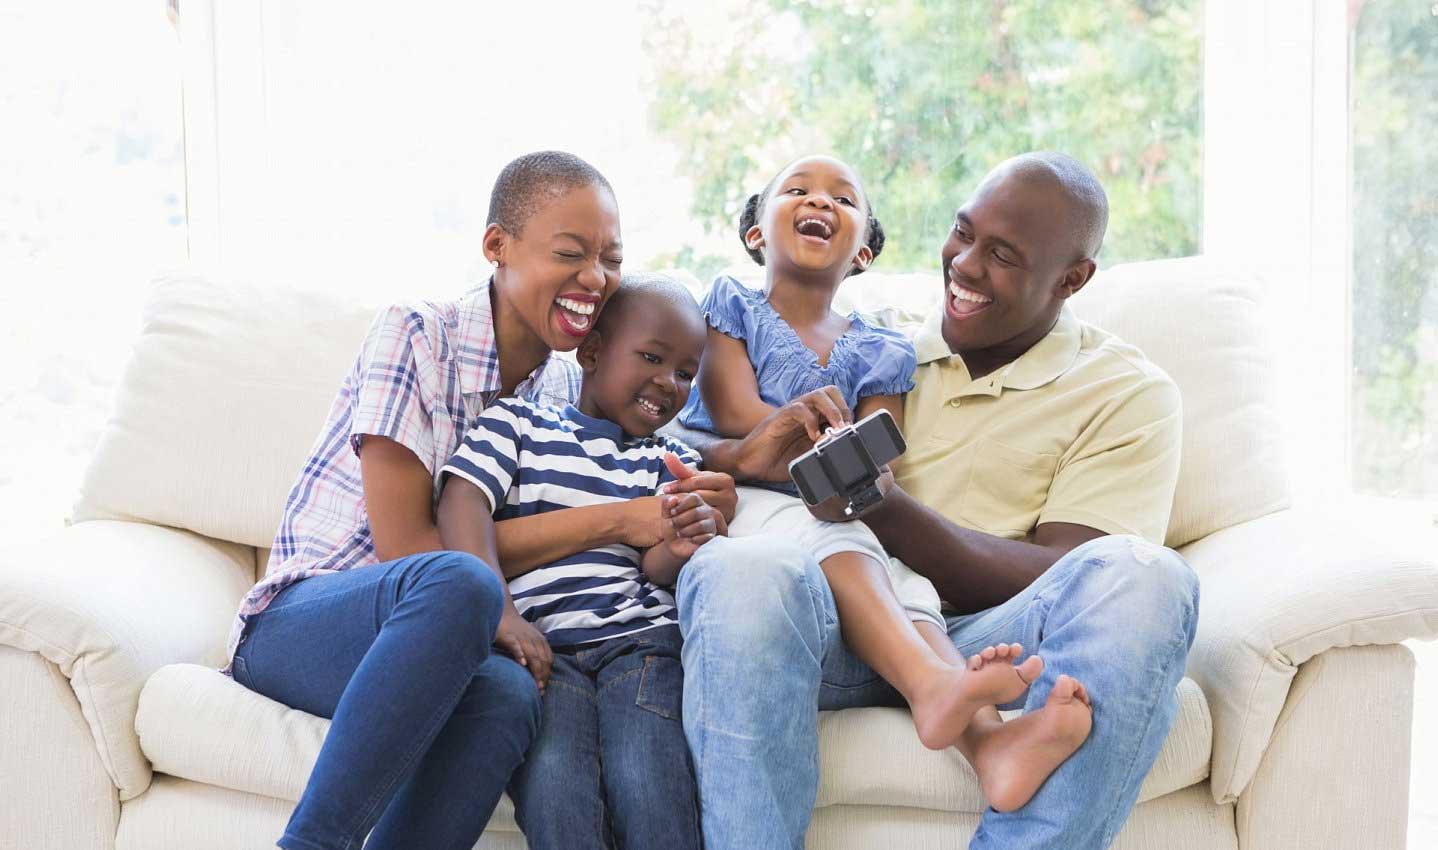 happy family having a selfie